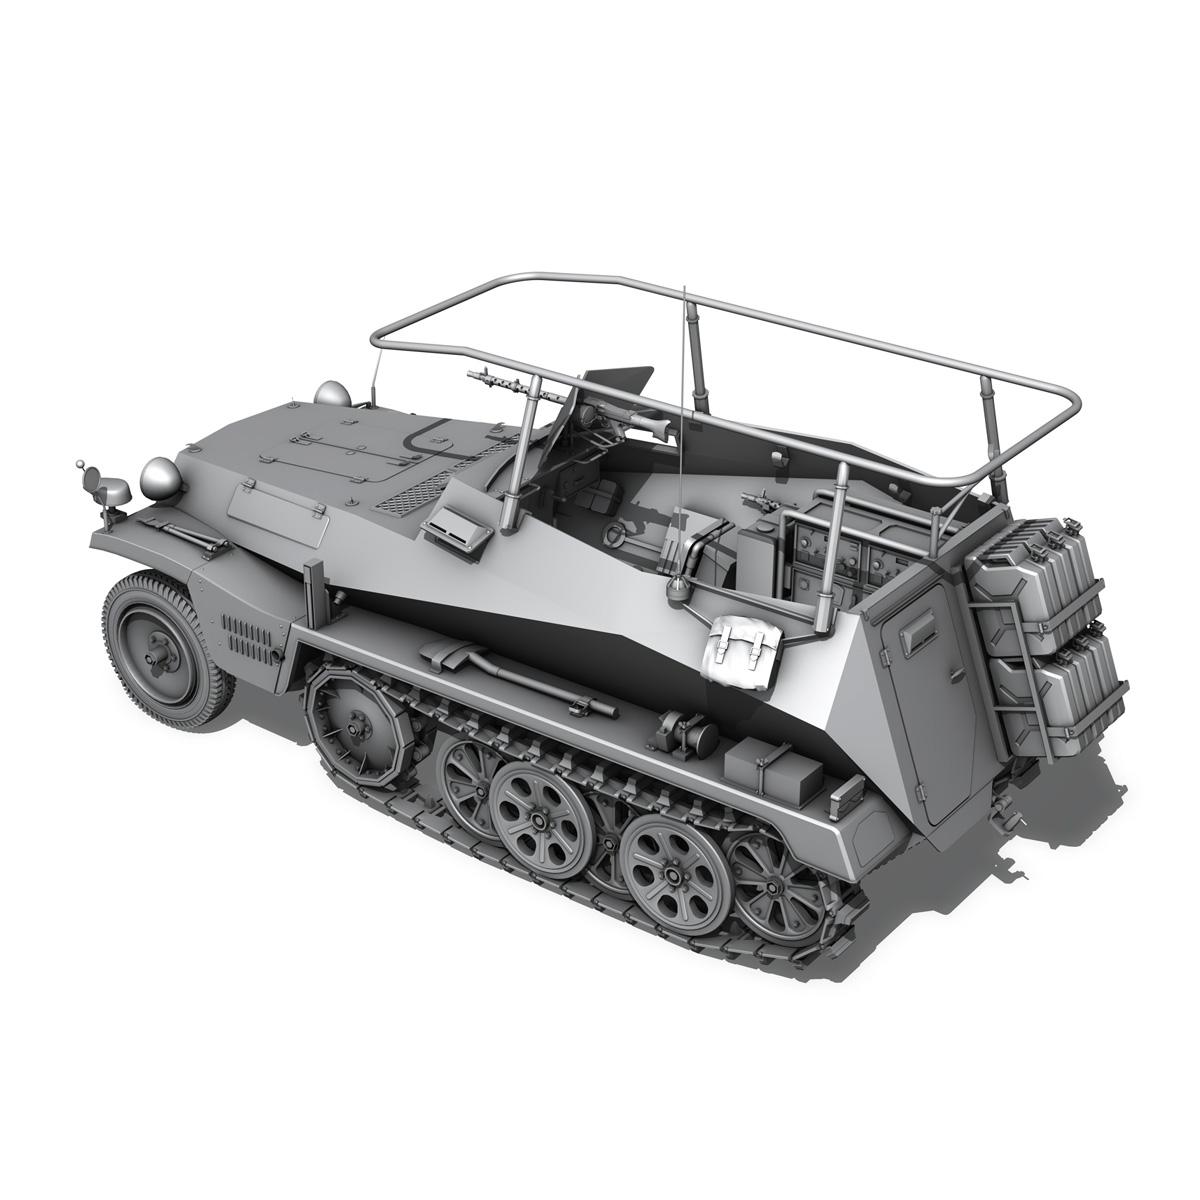 sdkfz 250 – command halftrack 3d model 3ds fbx c4d lwo obj 251671